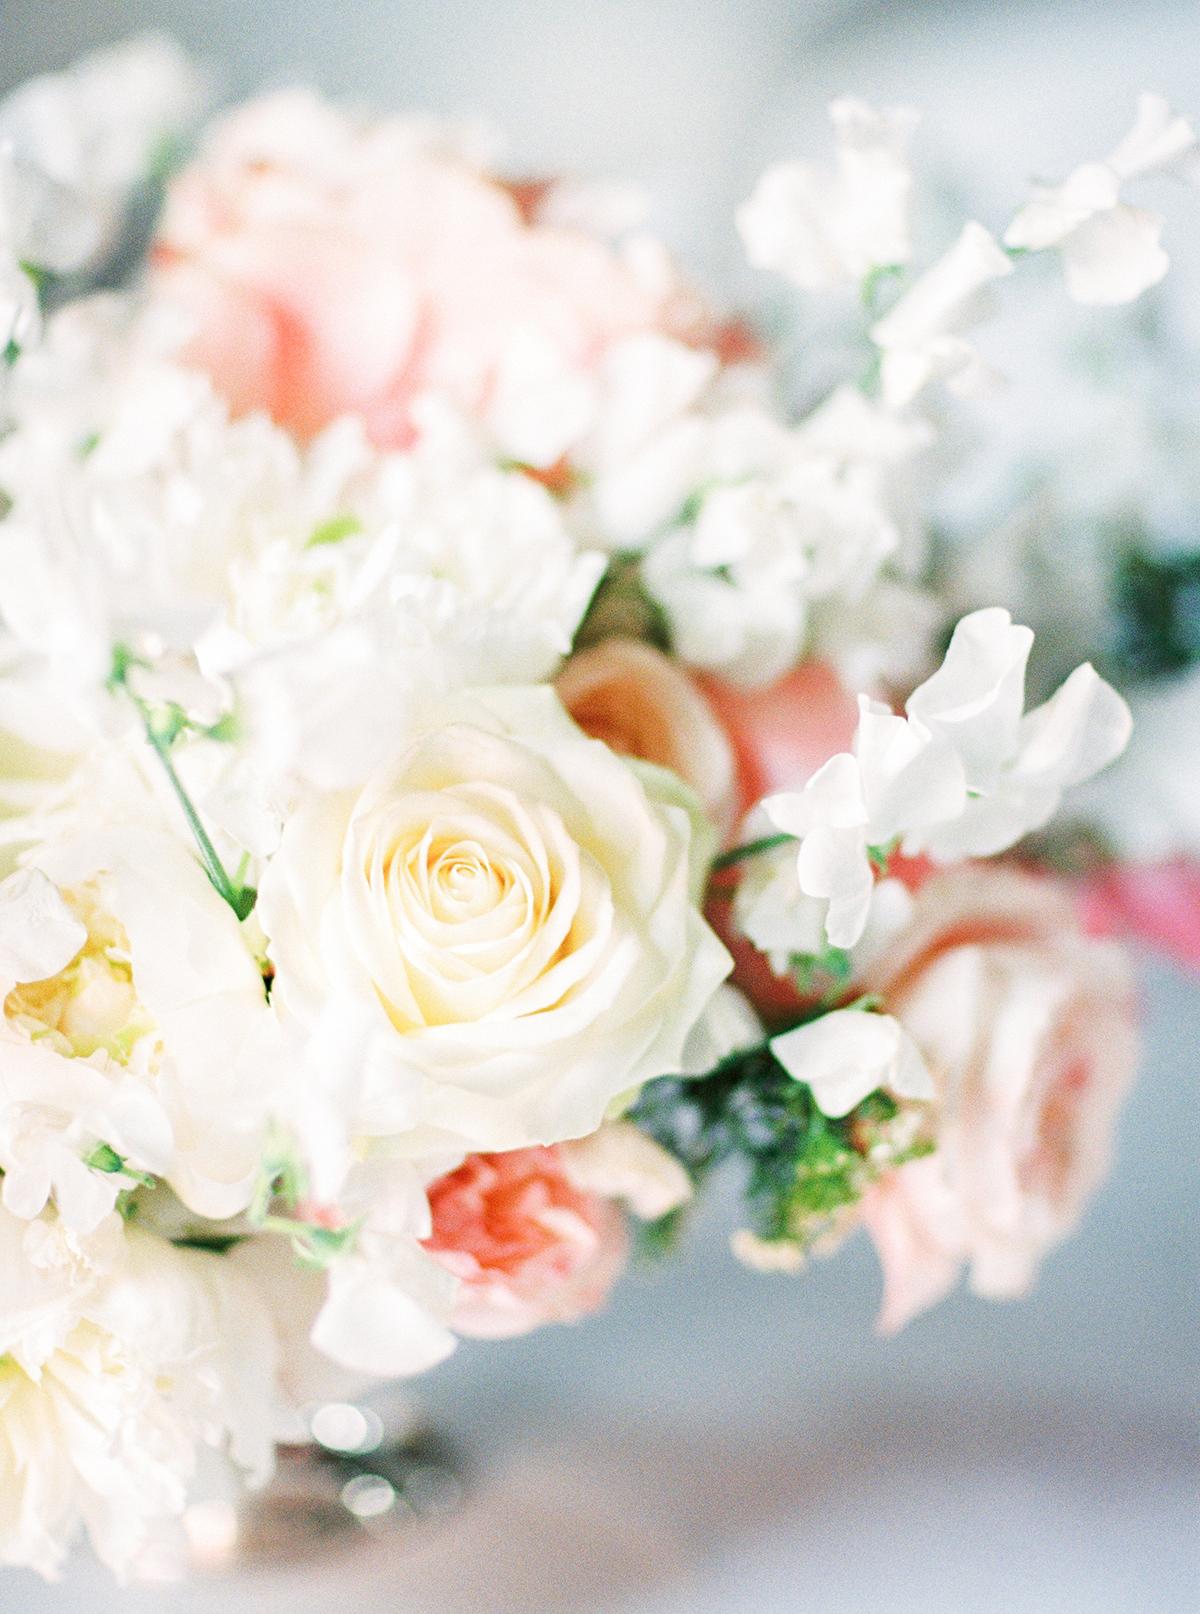 Mary Lennox Flowers Berlin| Landgut Stober Hochzeit | Fine Art Film Wedding Photography by Ashley Ludaescher (42)